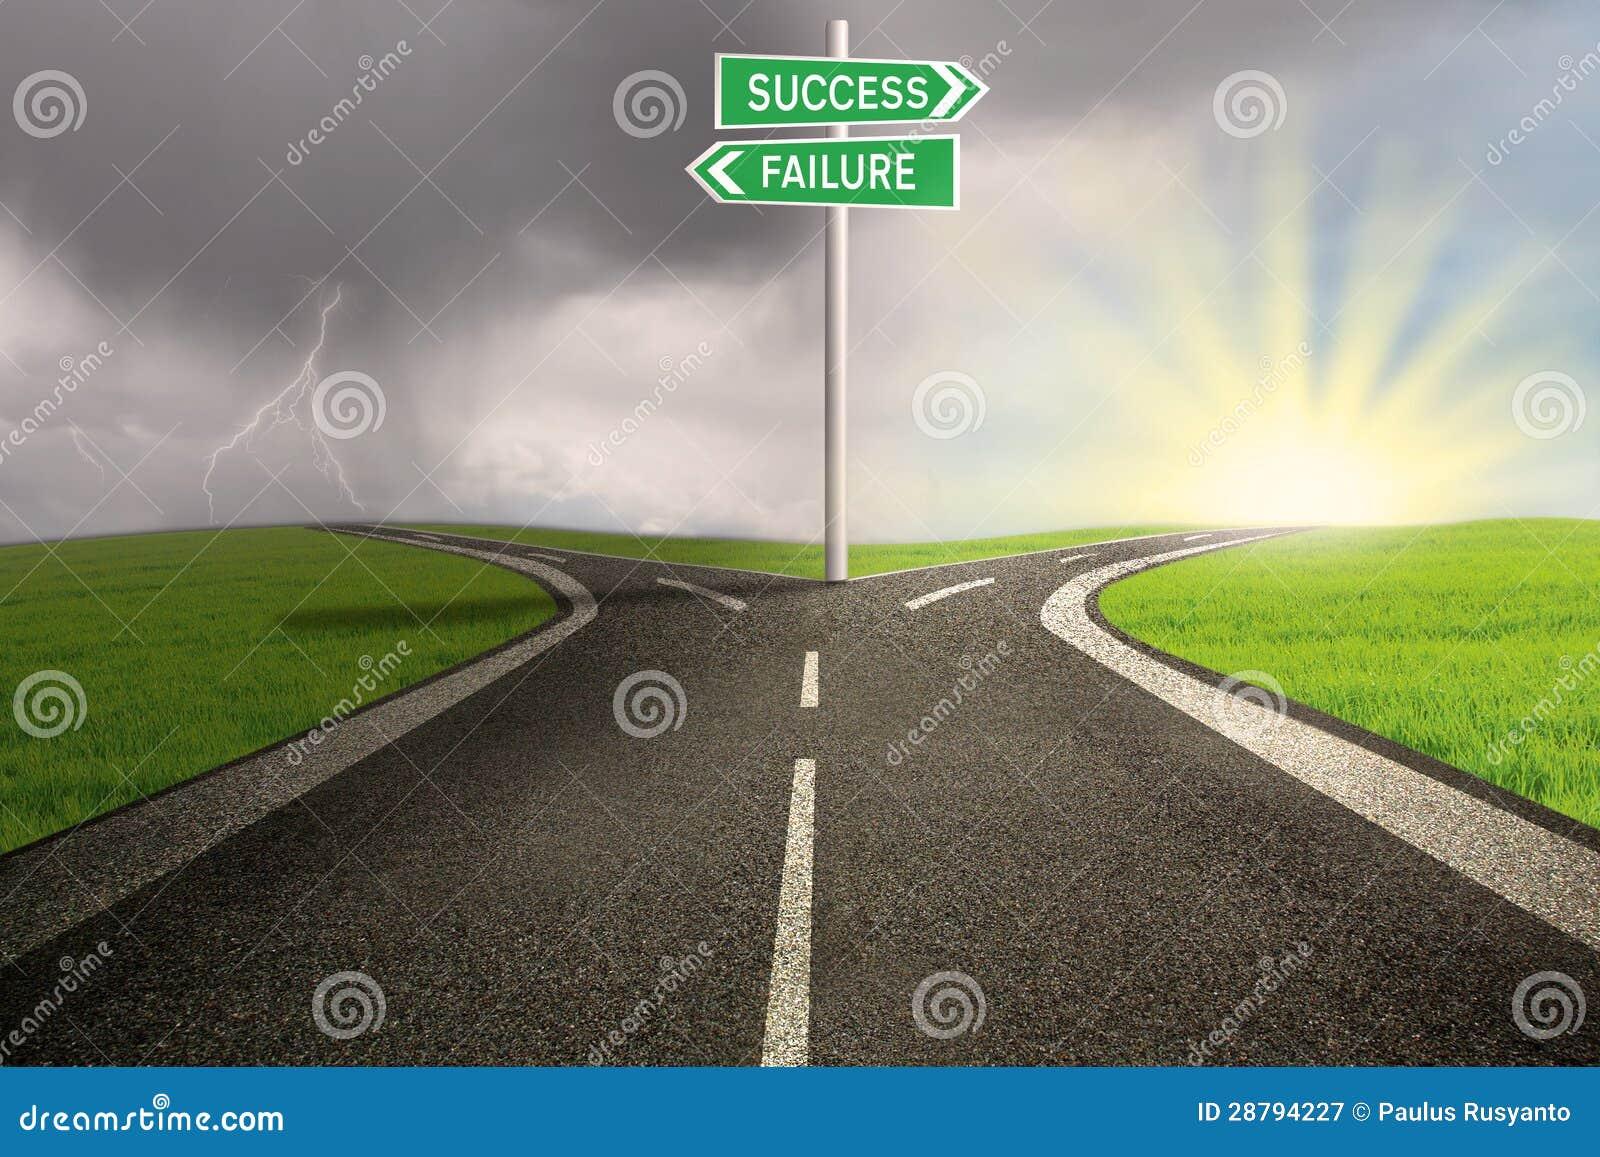 Failure road to success